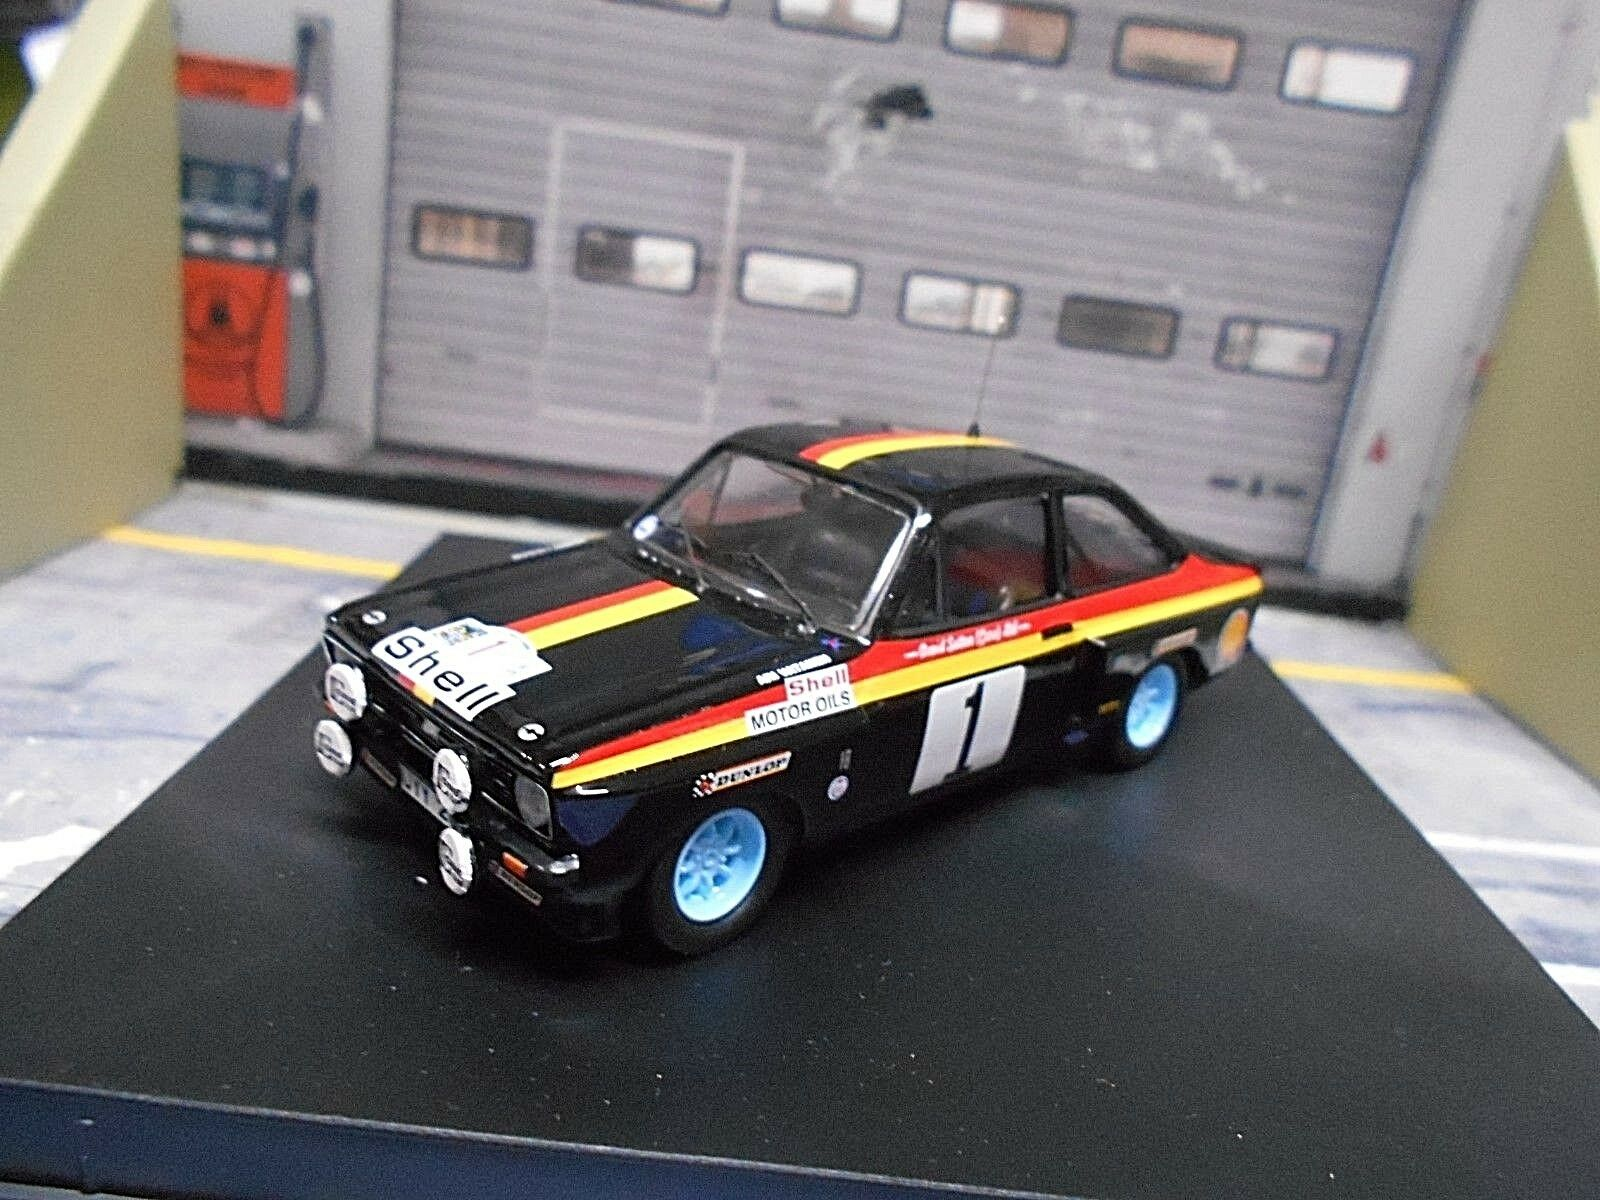 diseño simple y generoso Ford Escort MKII rally rally rally breitbau Madeira 1978  1 vatanen winner she Trofeu 1 43  bajo precio